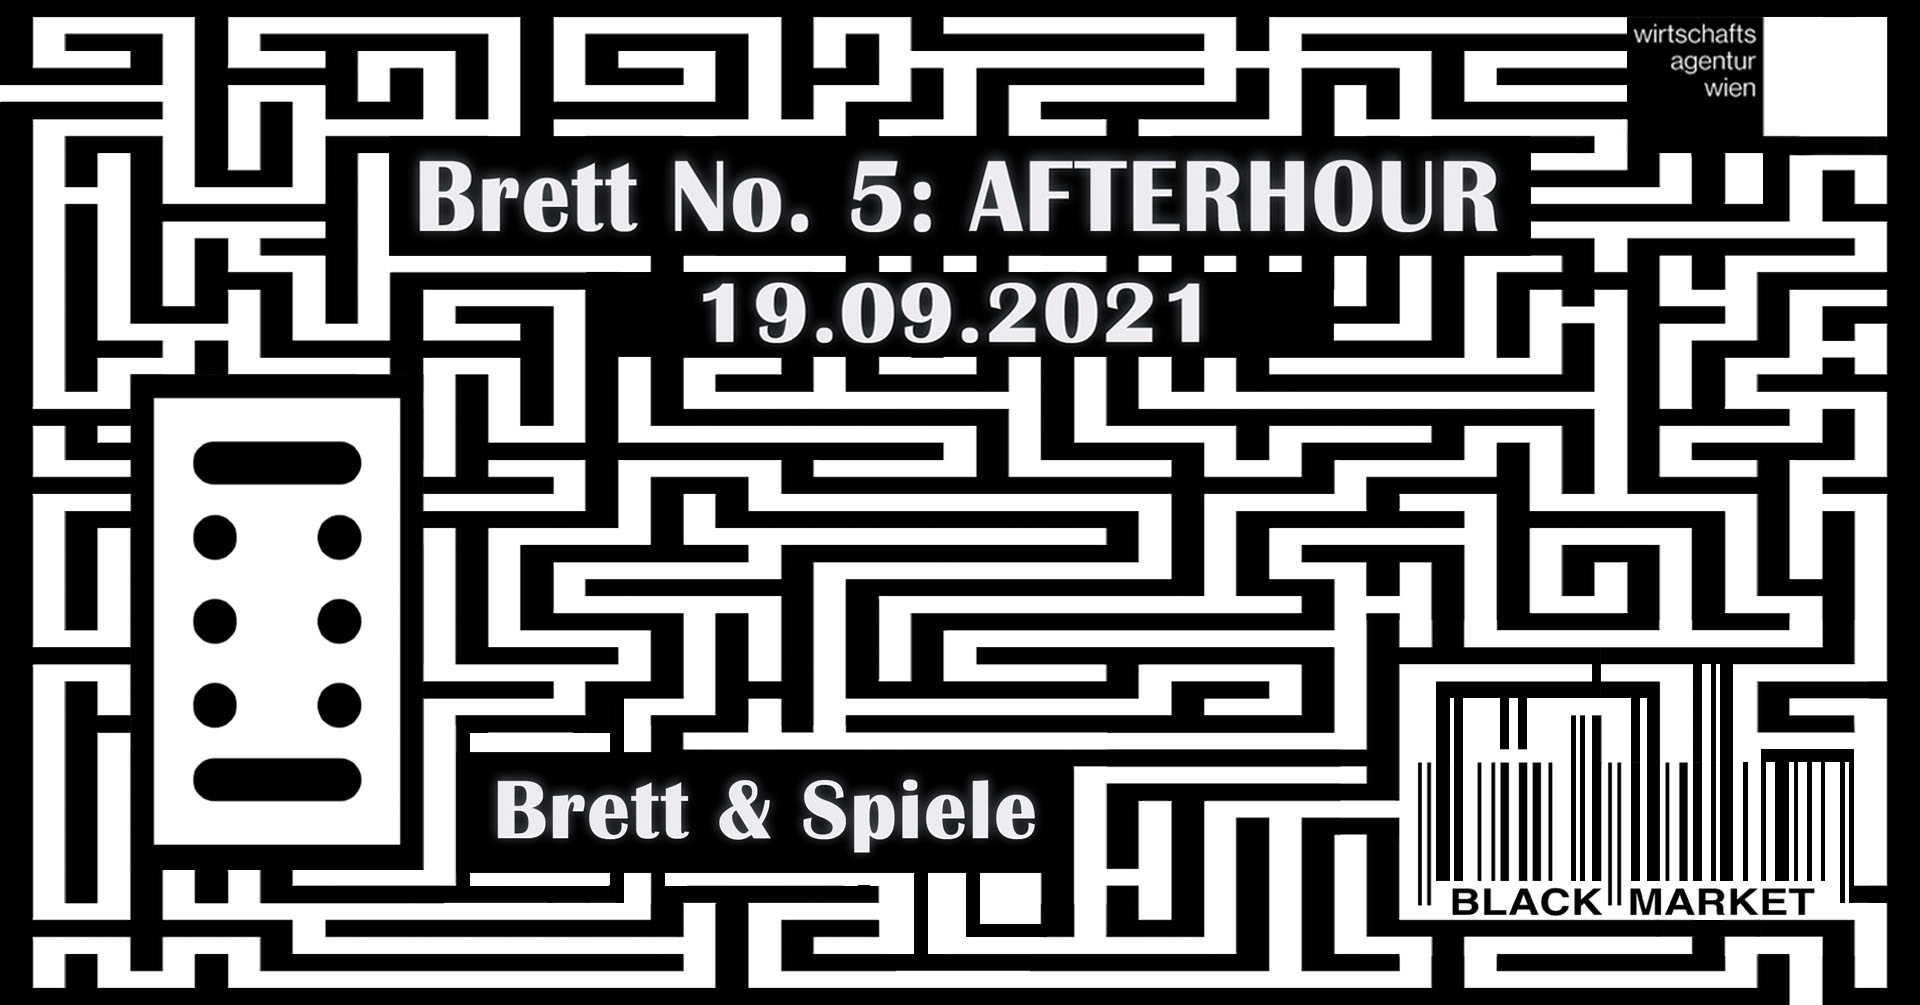 Events Wien: Brett No 5: AFTERHOUR mit Hard Techno im Black Market